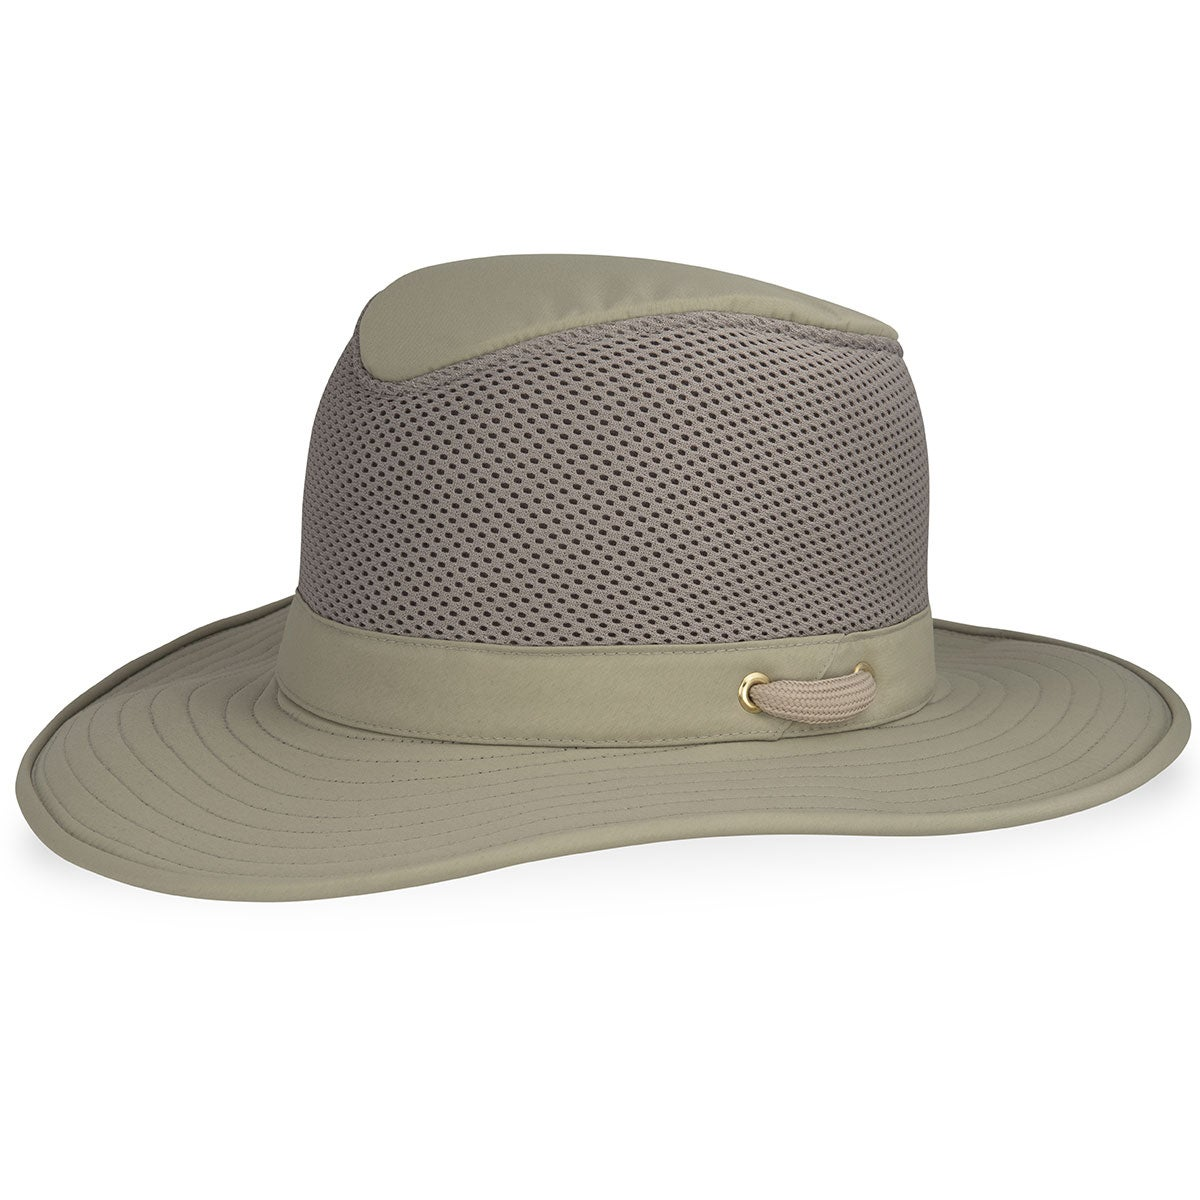 Tilley Airflo Broader Brim Nylon Mesh Hat in Khaki,Olive